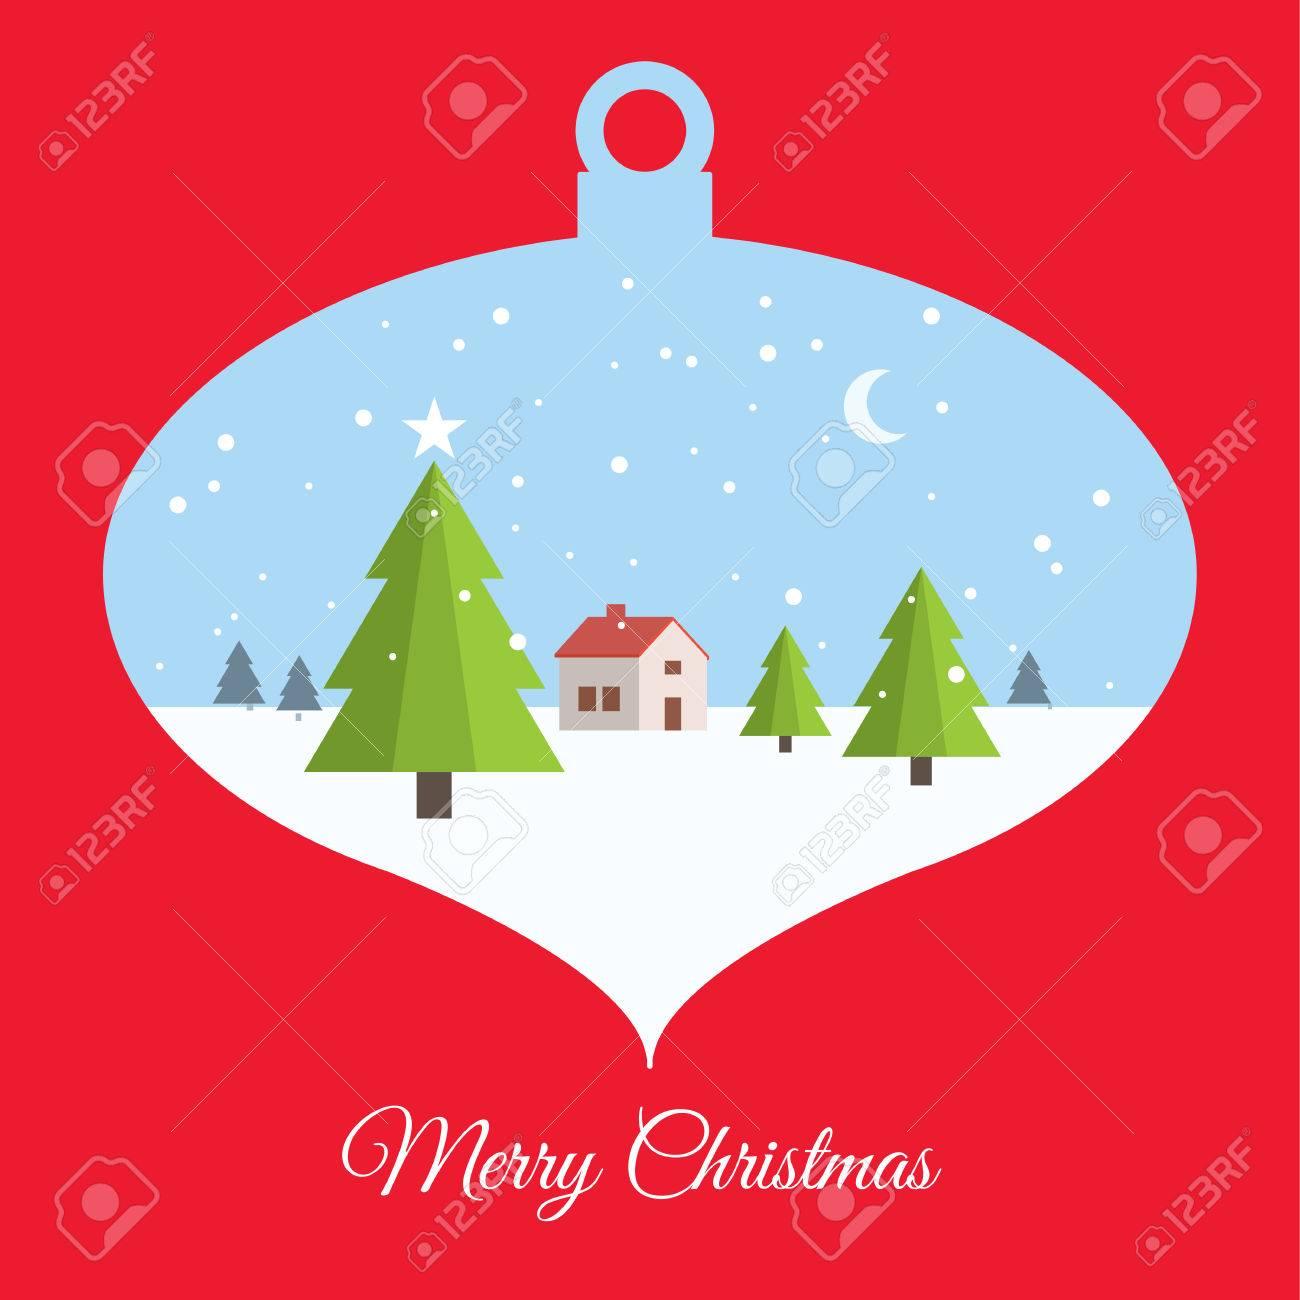 Merry Christmas Card, With Christmas Ball Scene Royalty Free ...